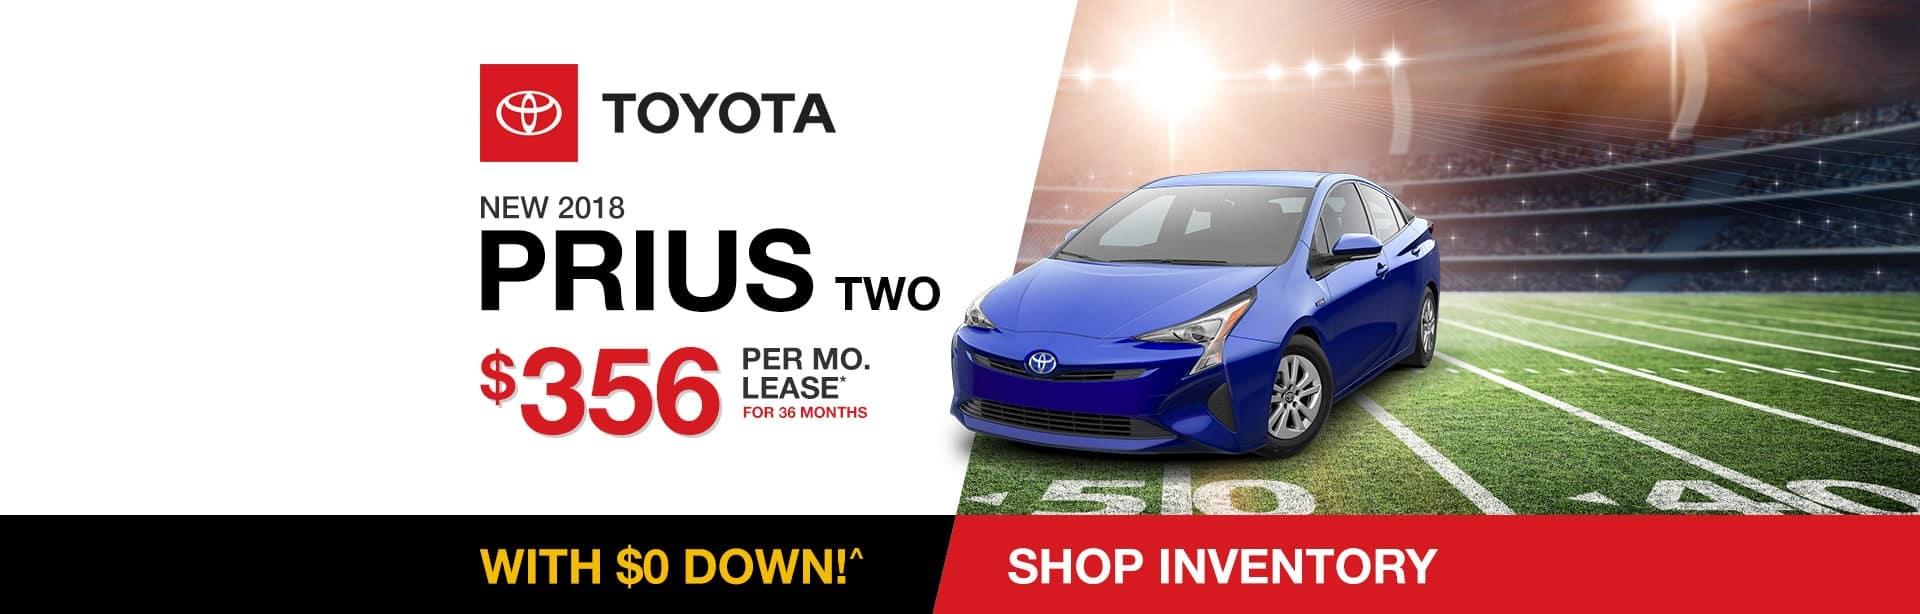 Toyota Prius Lease Special near Columbus, Indiana